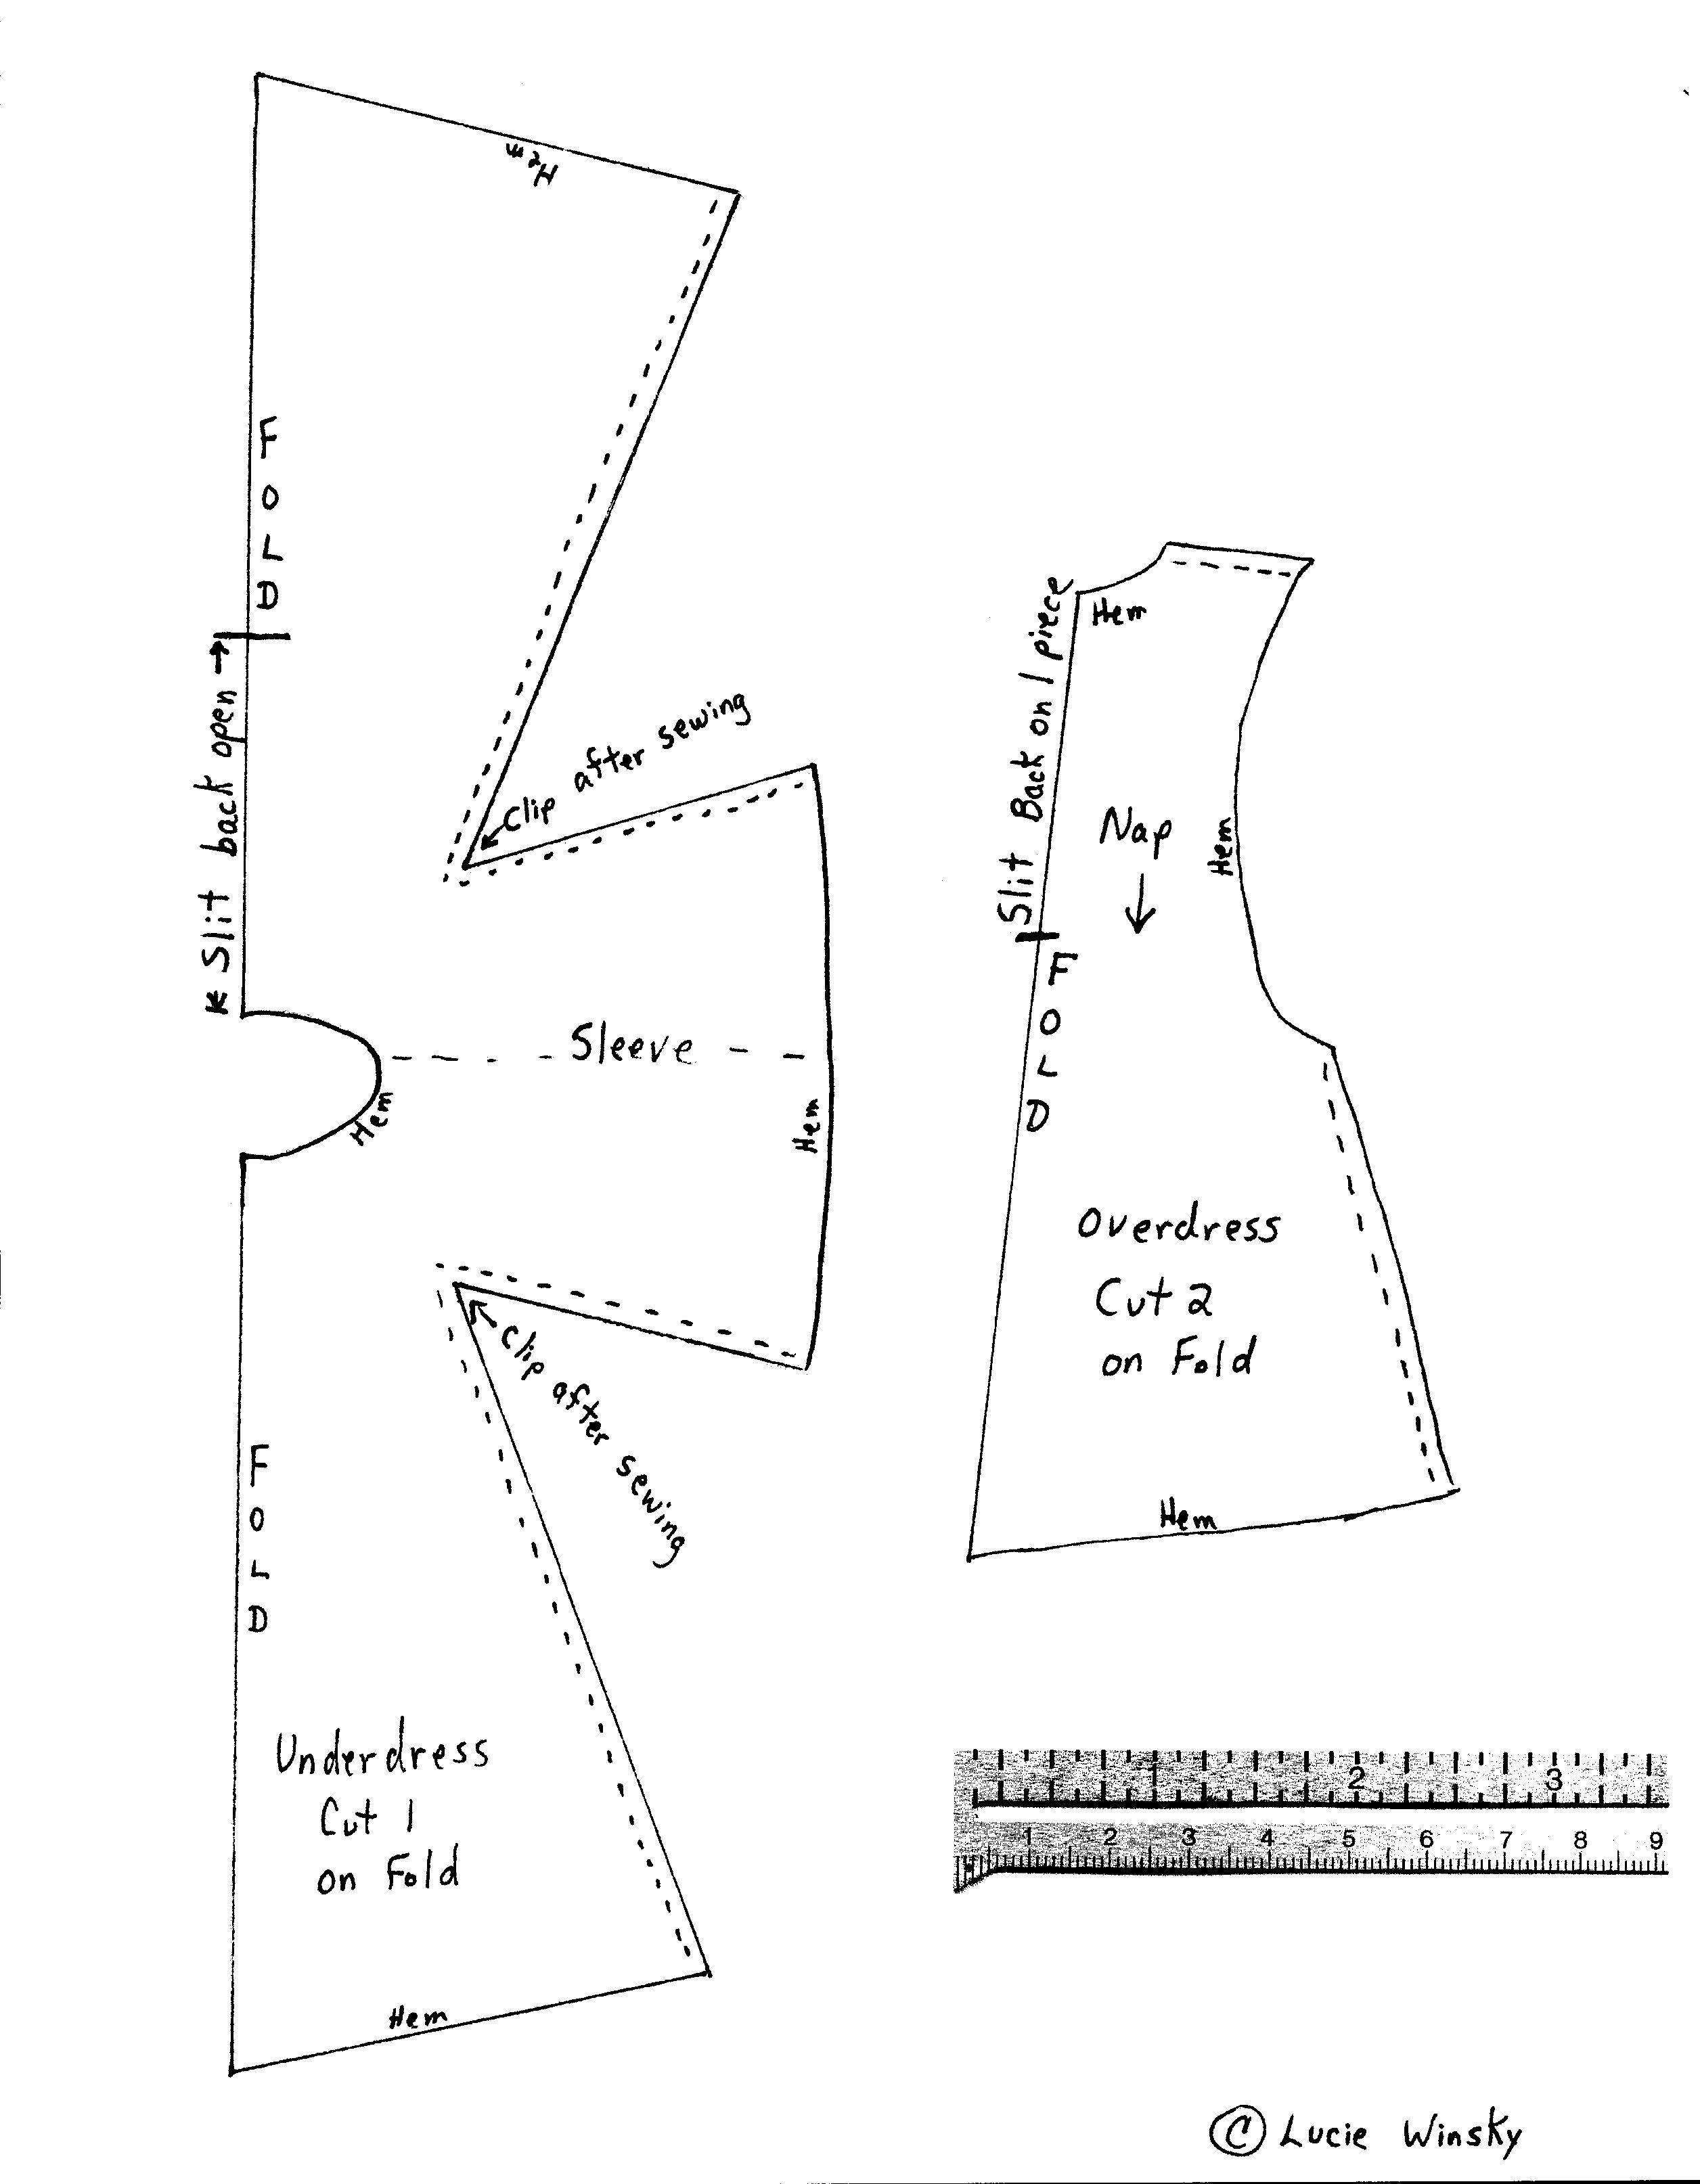 patron-robe-poupee-medievale.jpg (2512×3228)